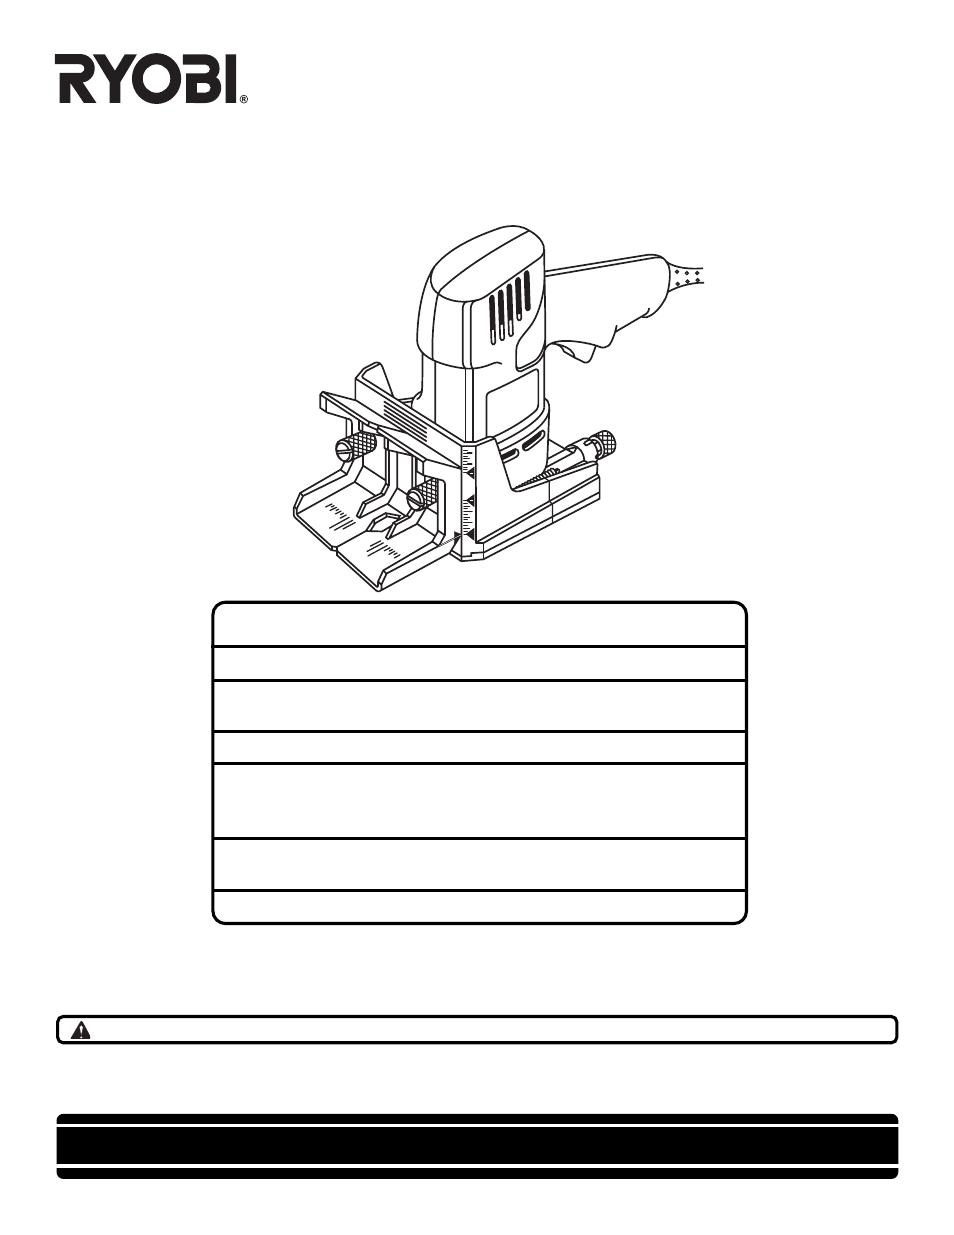 ryobi dbj50 user manual 22 pages rh manualsdir com Ryobi P2006 Owner's Manual Ryobi Parts